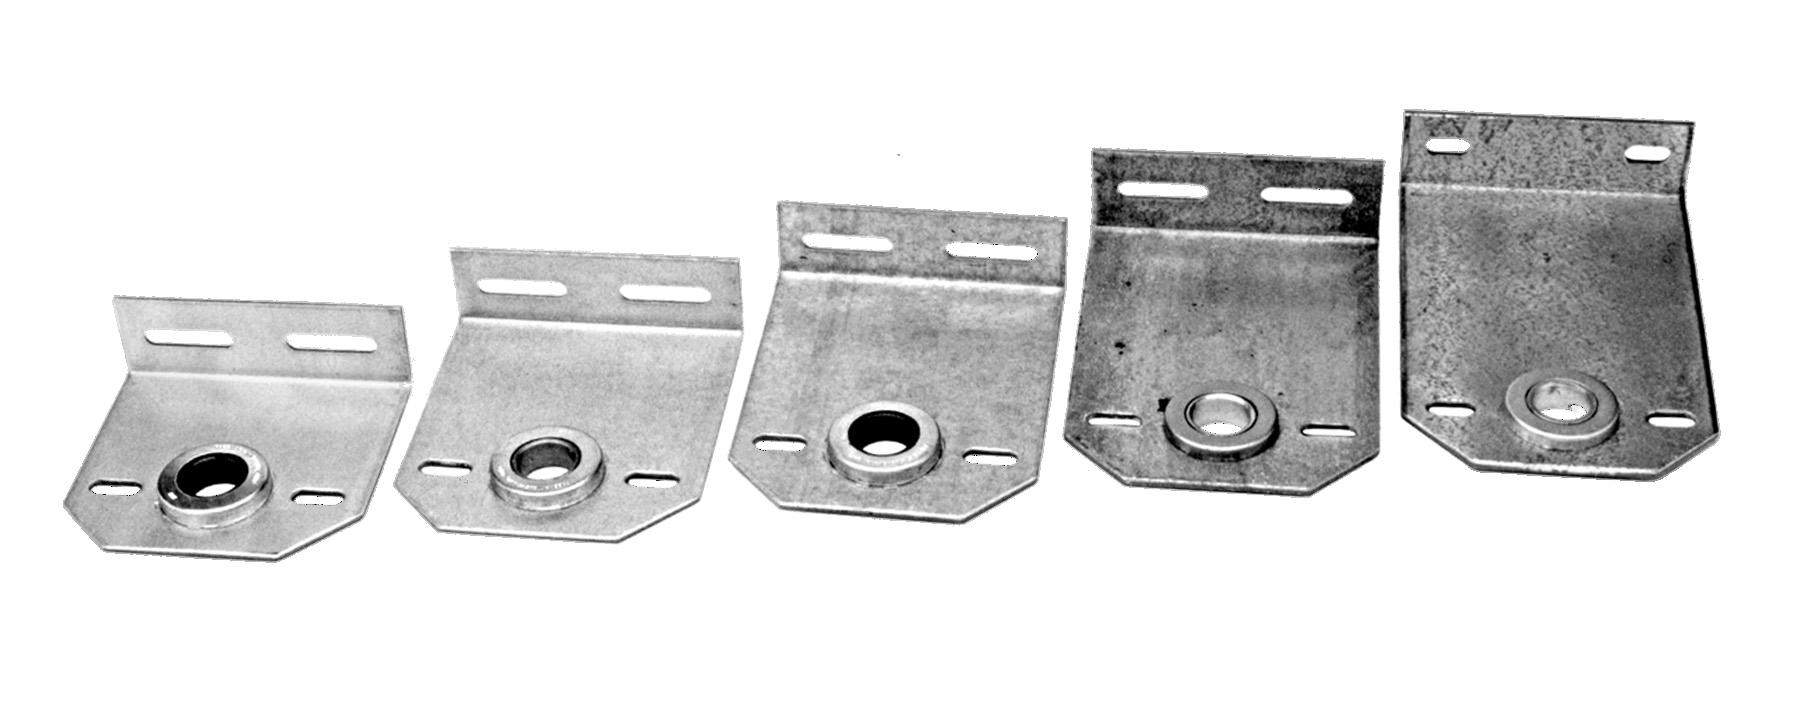 Residential Headplates Image